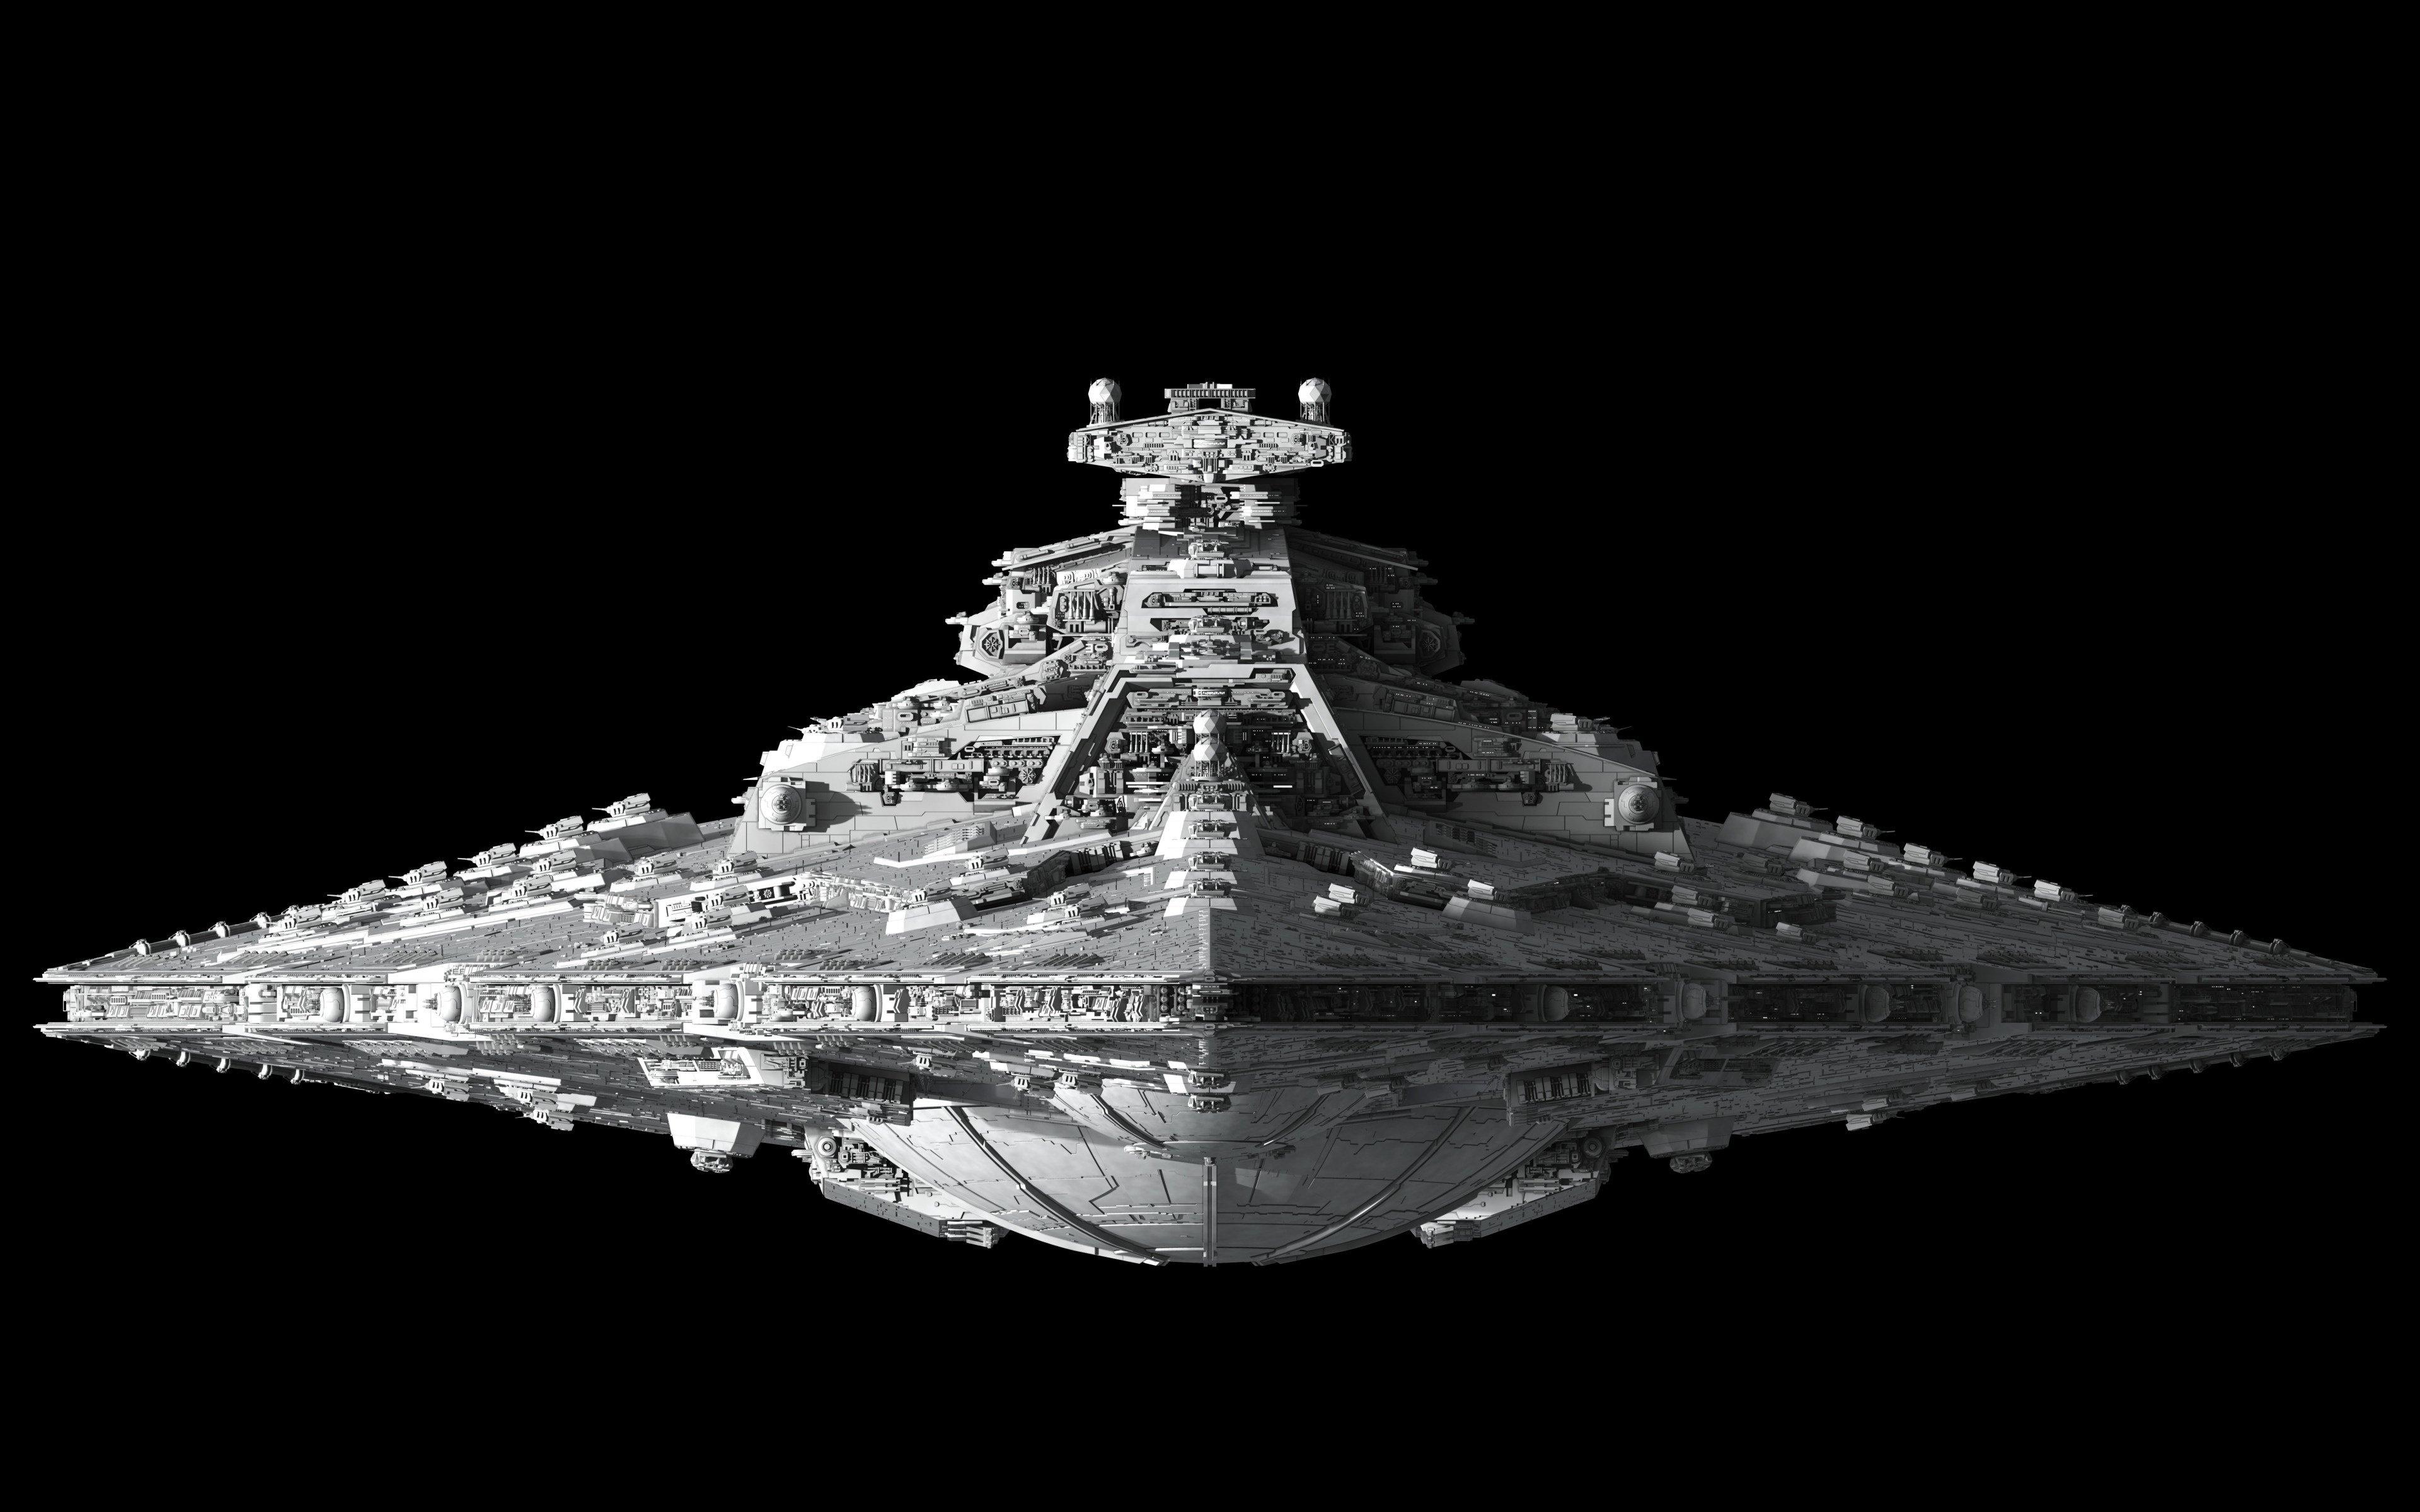 Star Destroyer 4k Wallpaper